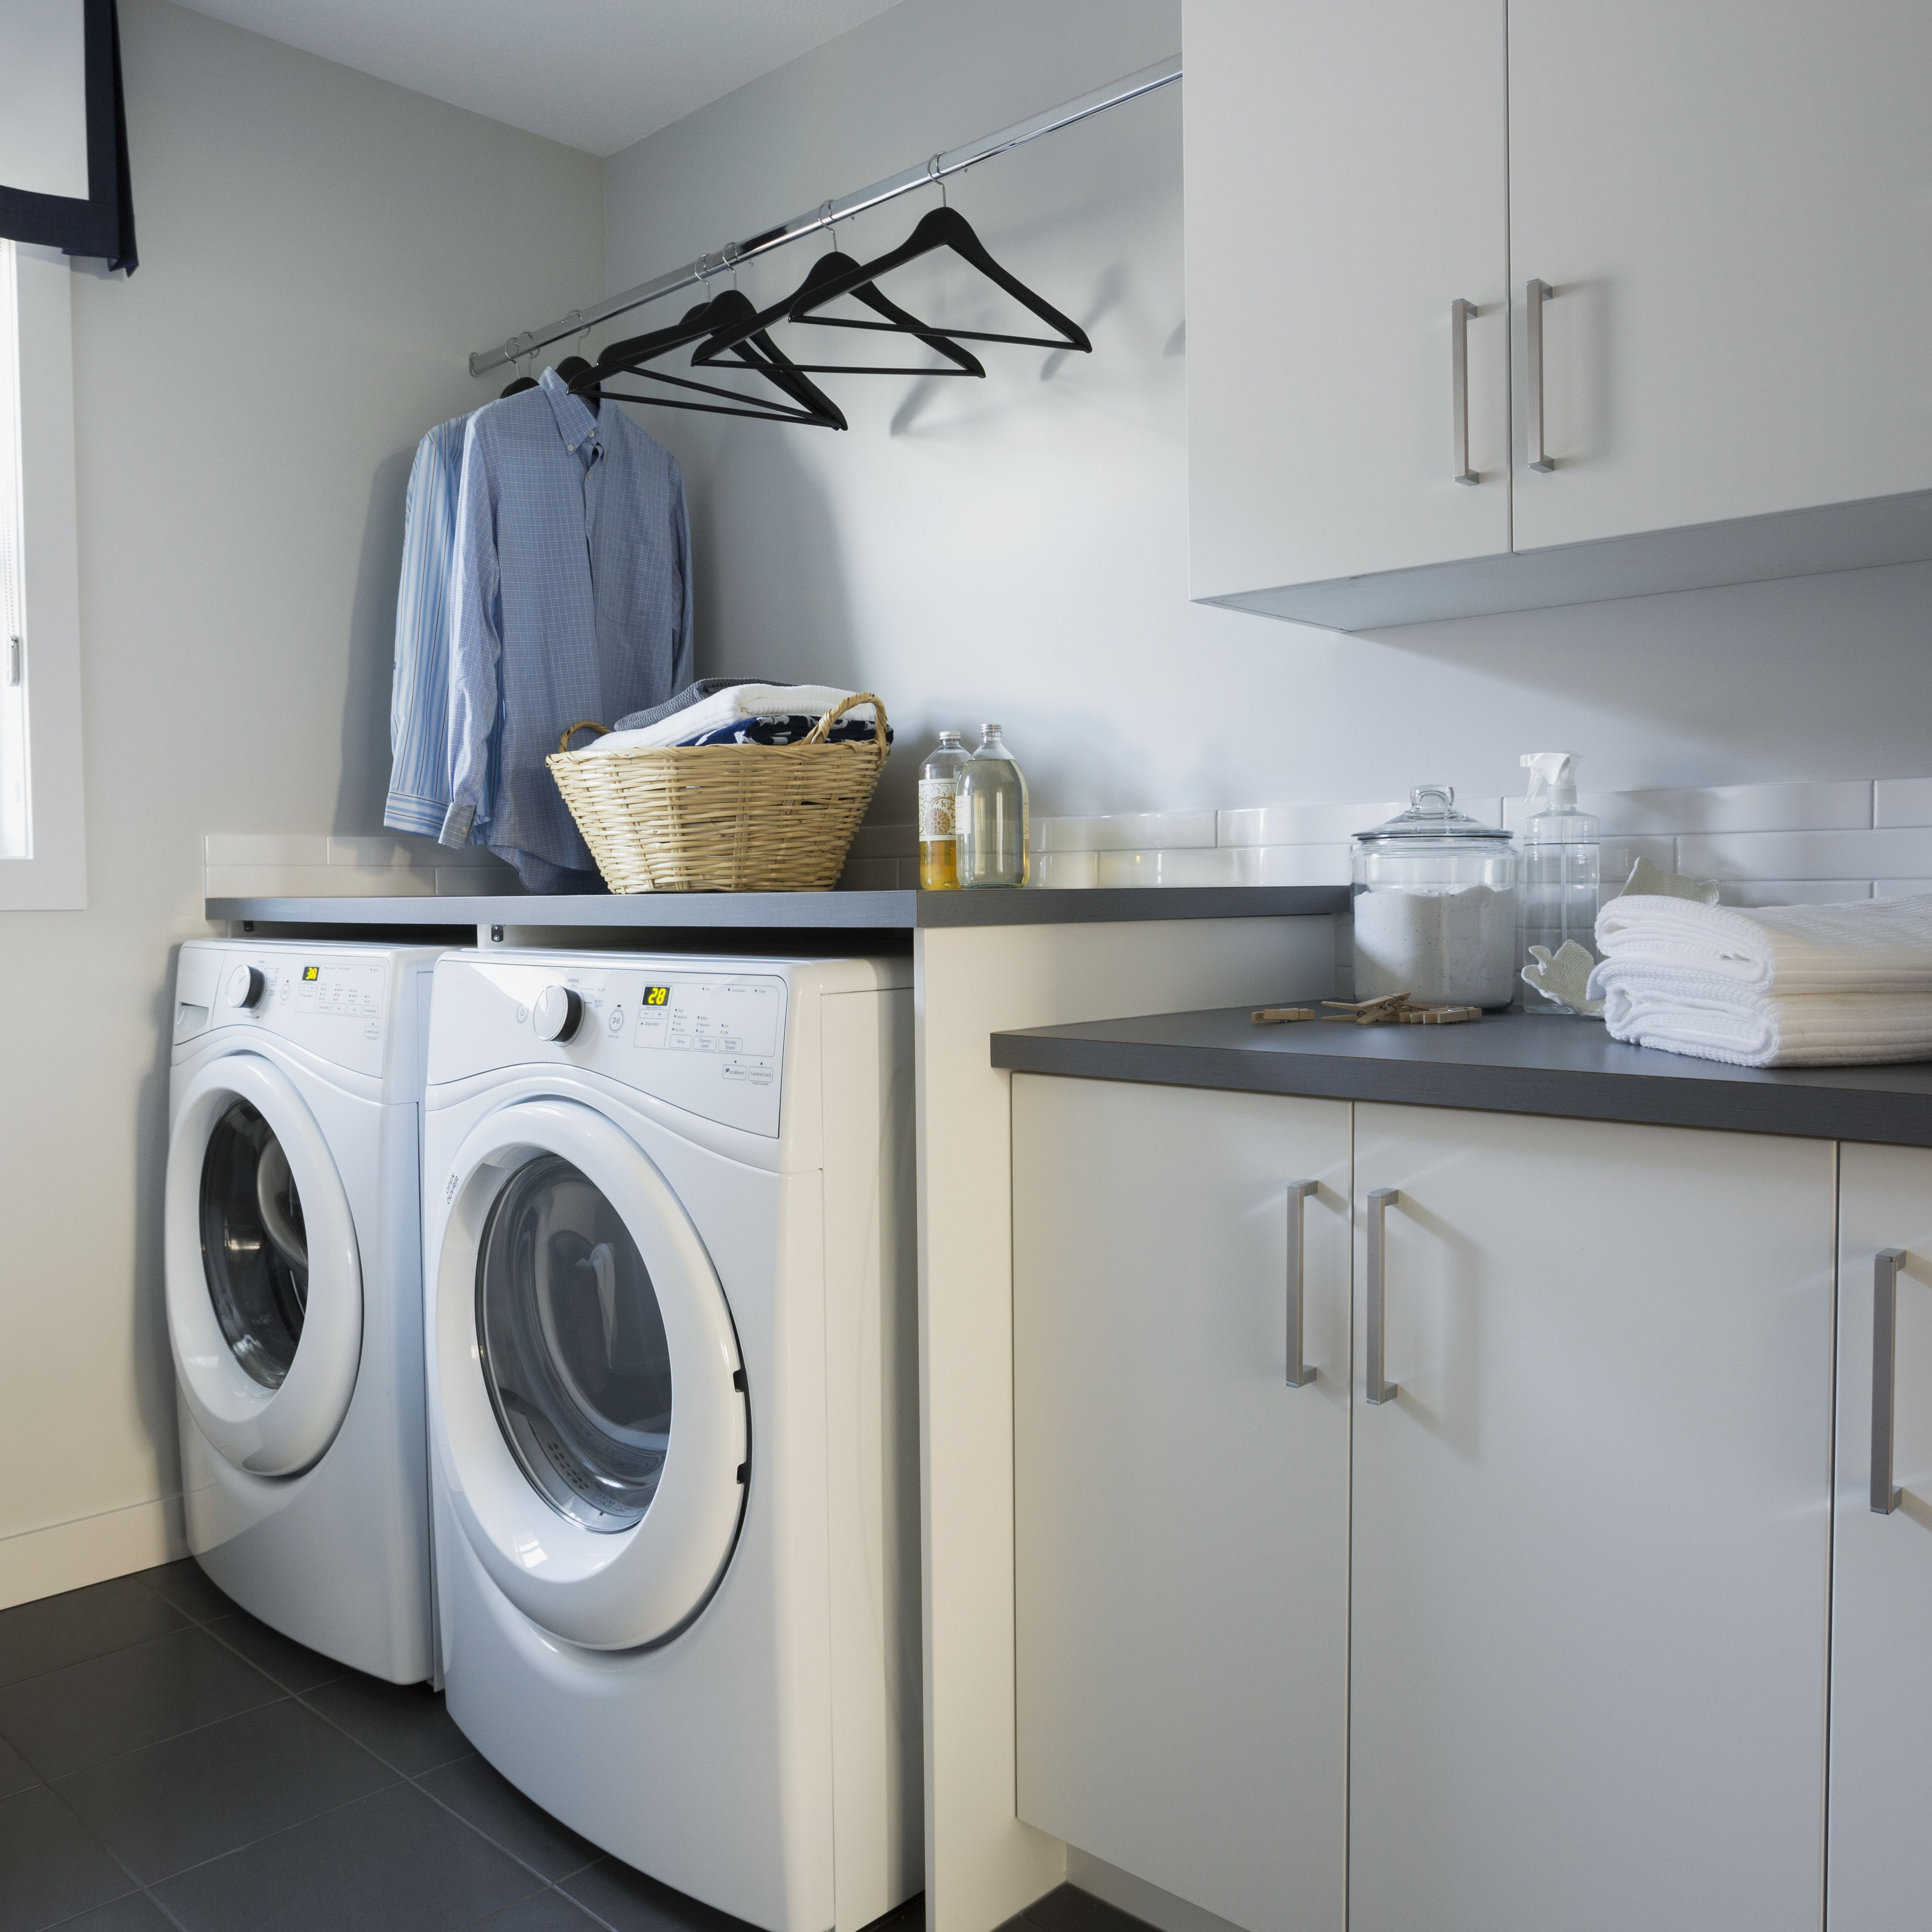 Where Should I Put the Laundry Room?